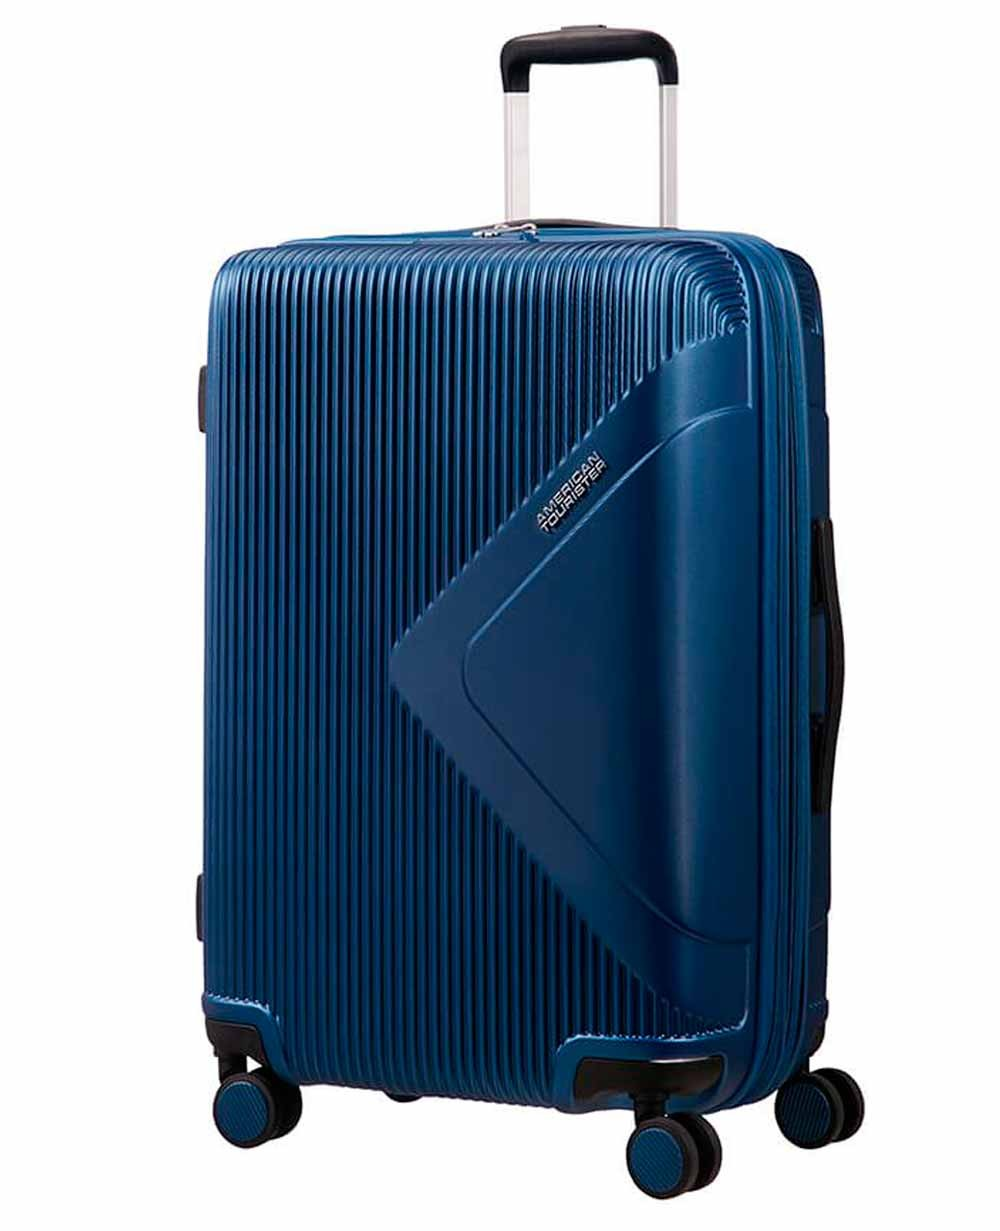 American Tourister Modern Dream Maleta mediana Azul (Foto )